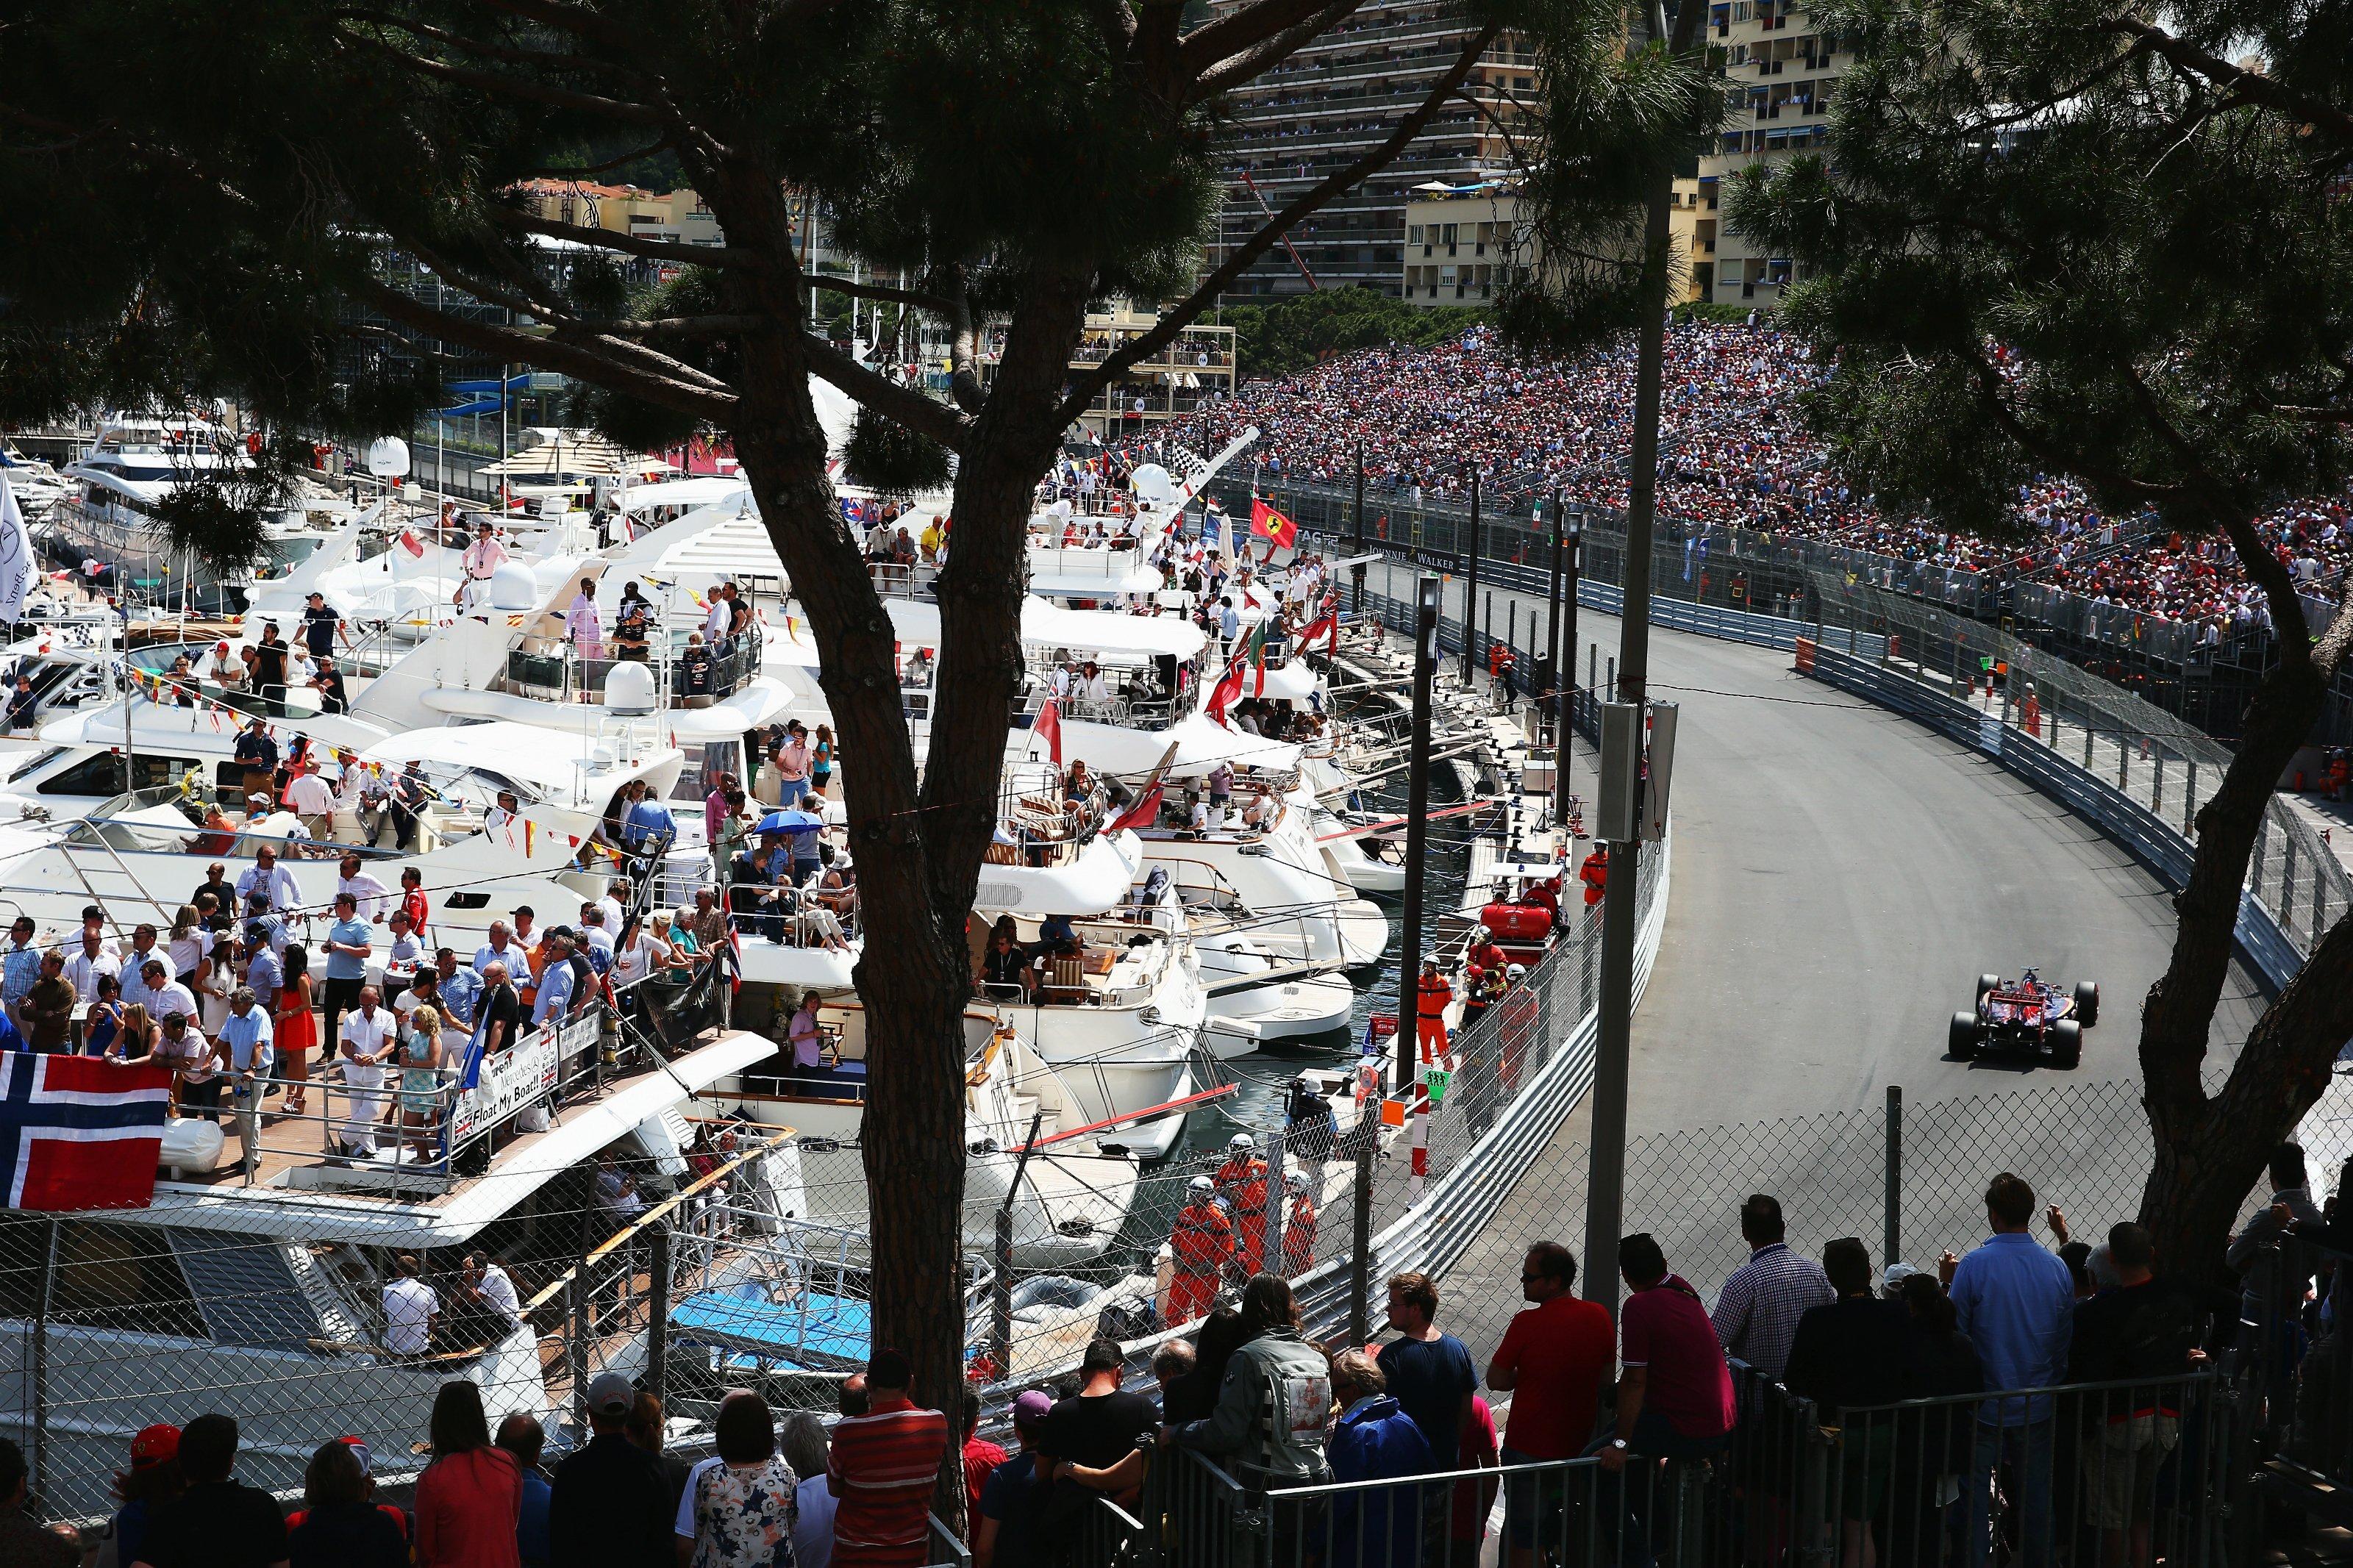 Monaco: le pagelle di Gian Carlo Minardi